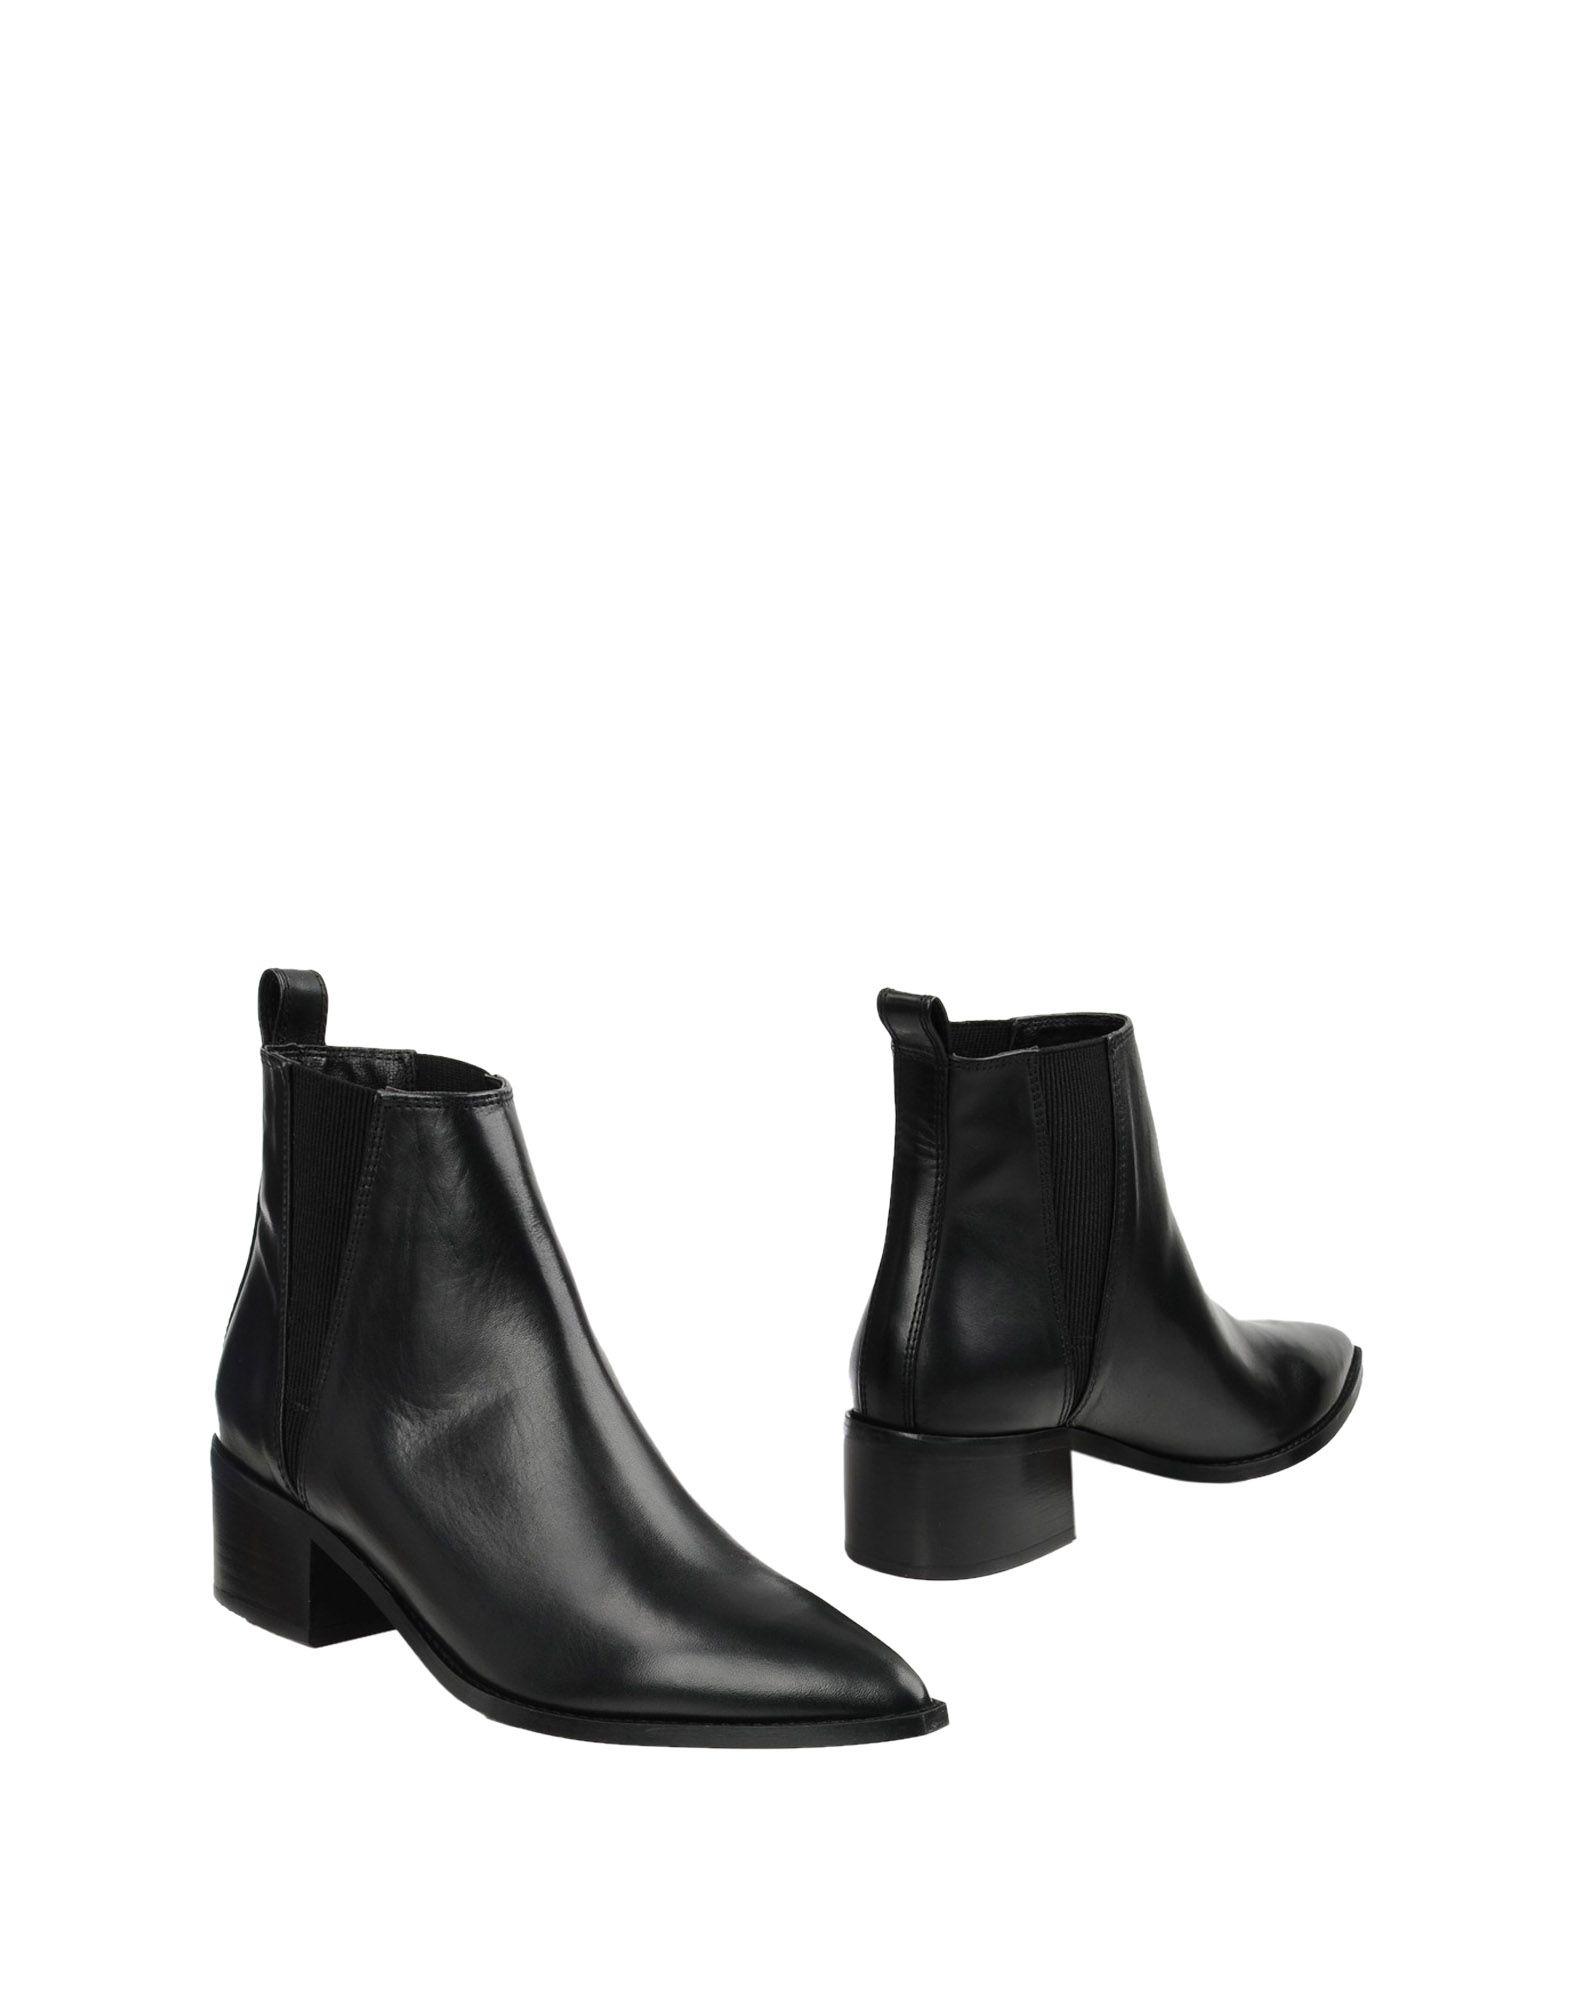 E8 by MIISTA Полусапоги и высокие ботинки miista полусапоги и высокие ботинки